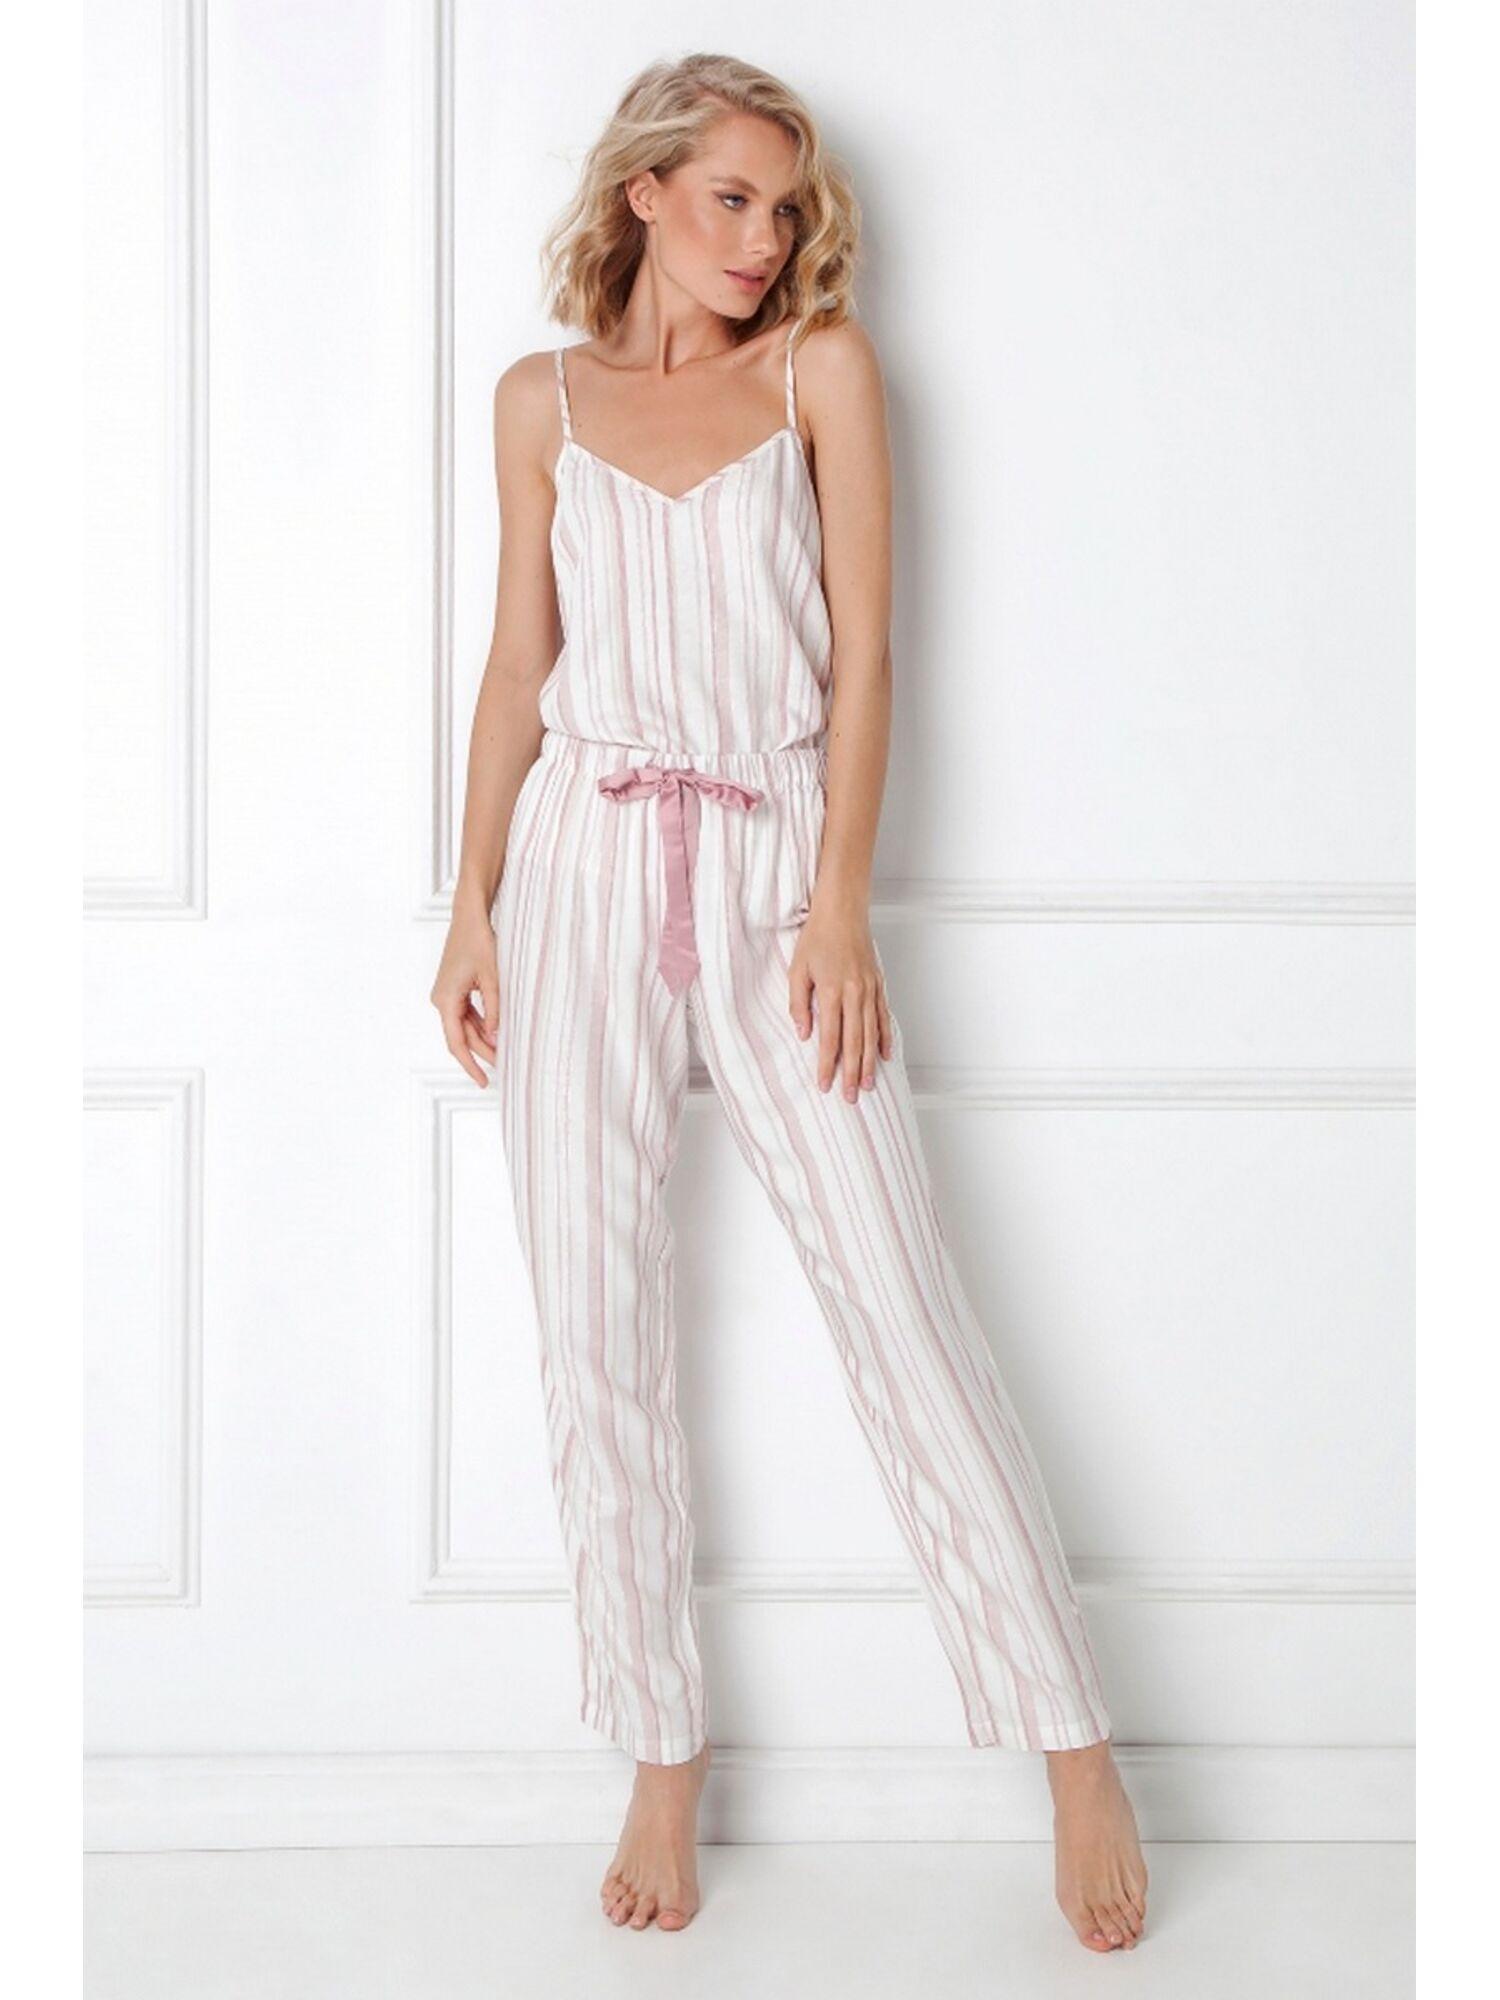 Пижама женская со штанами PAOLA, розовый, ARUELLE